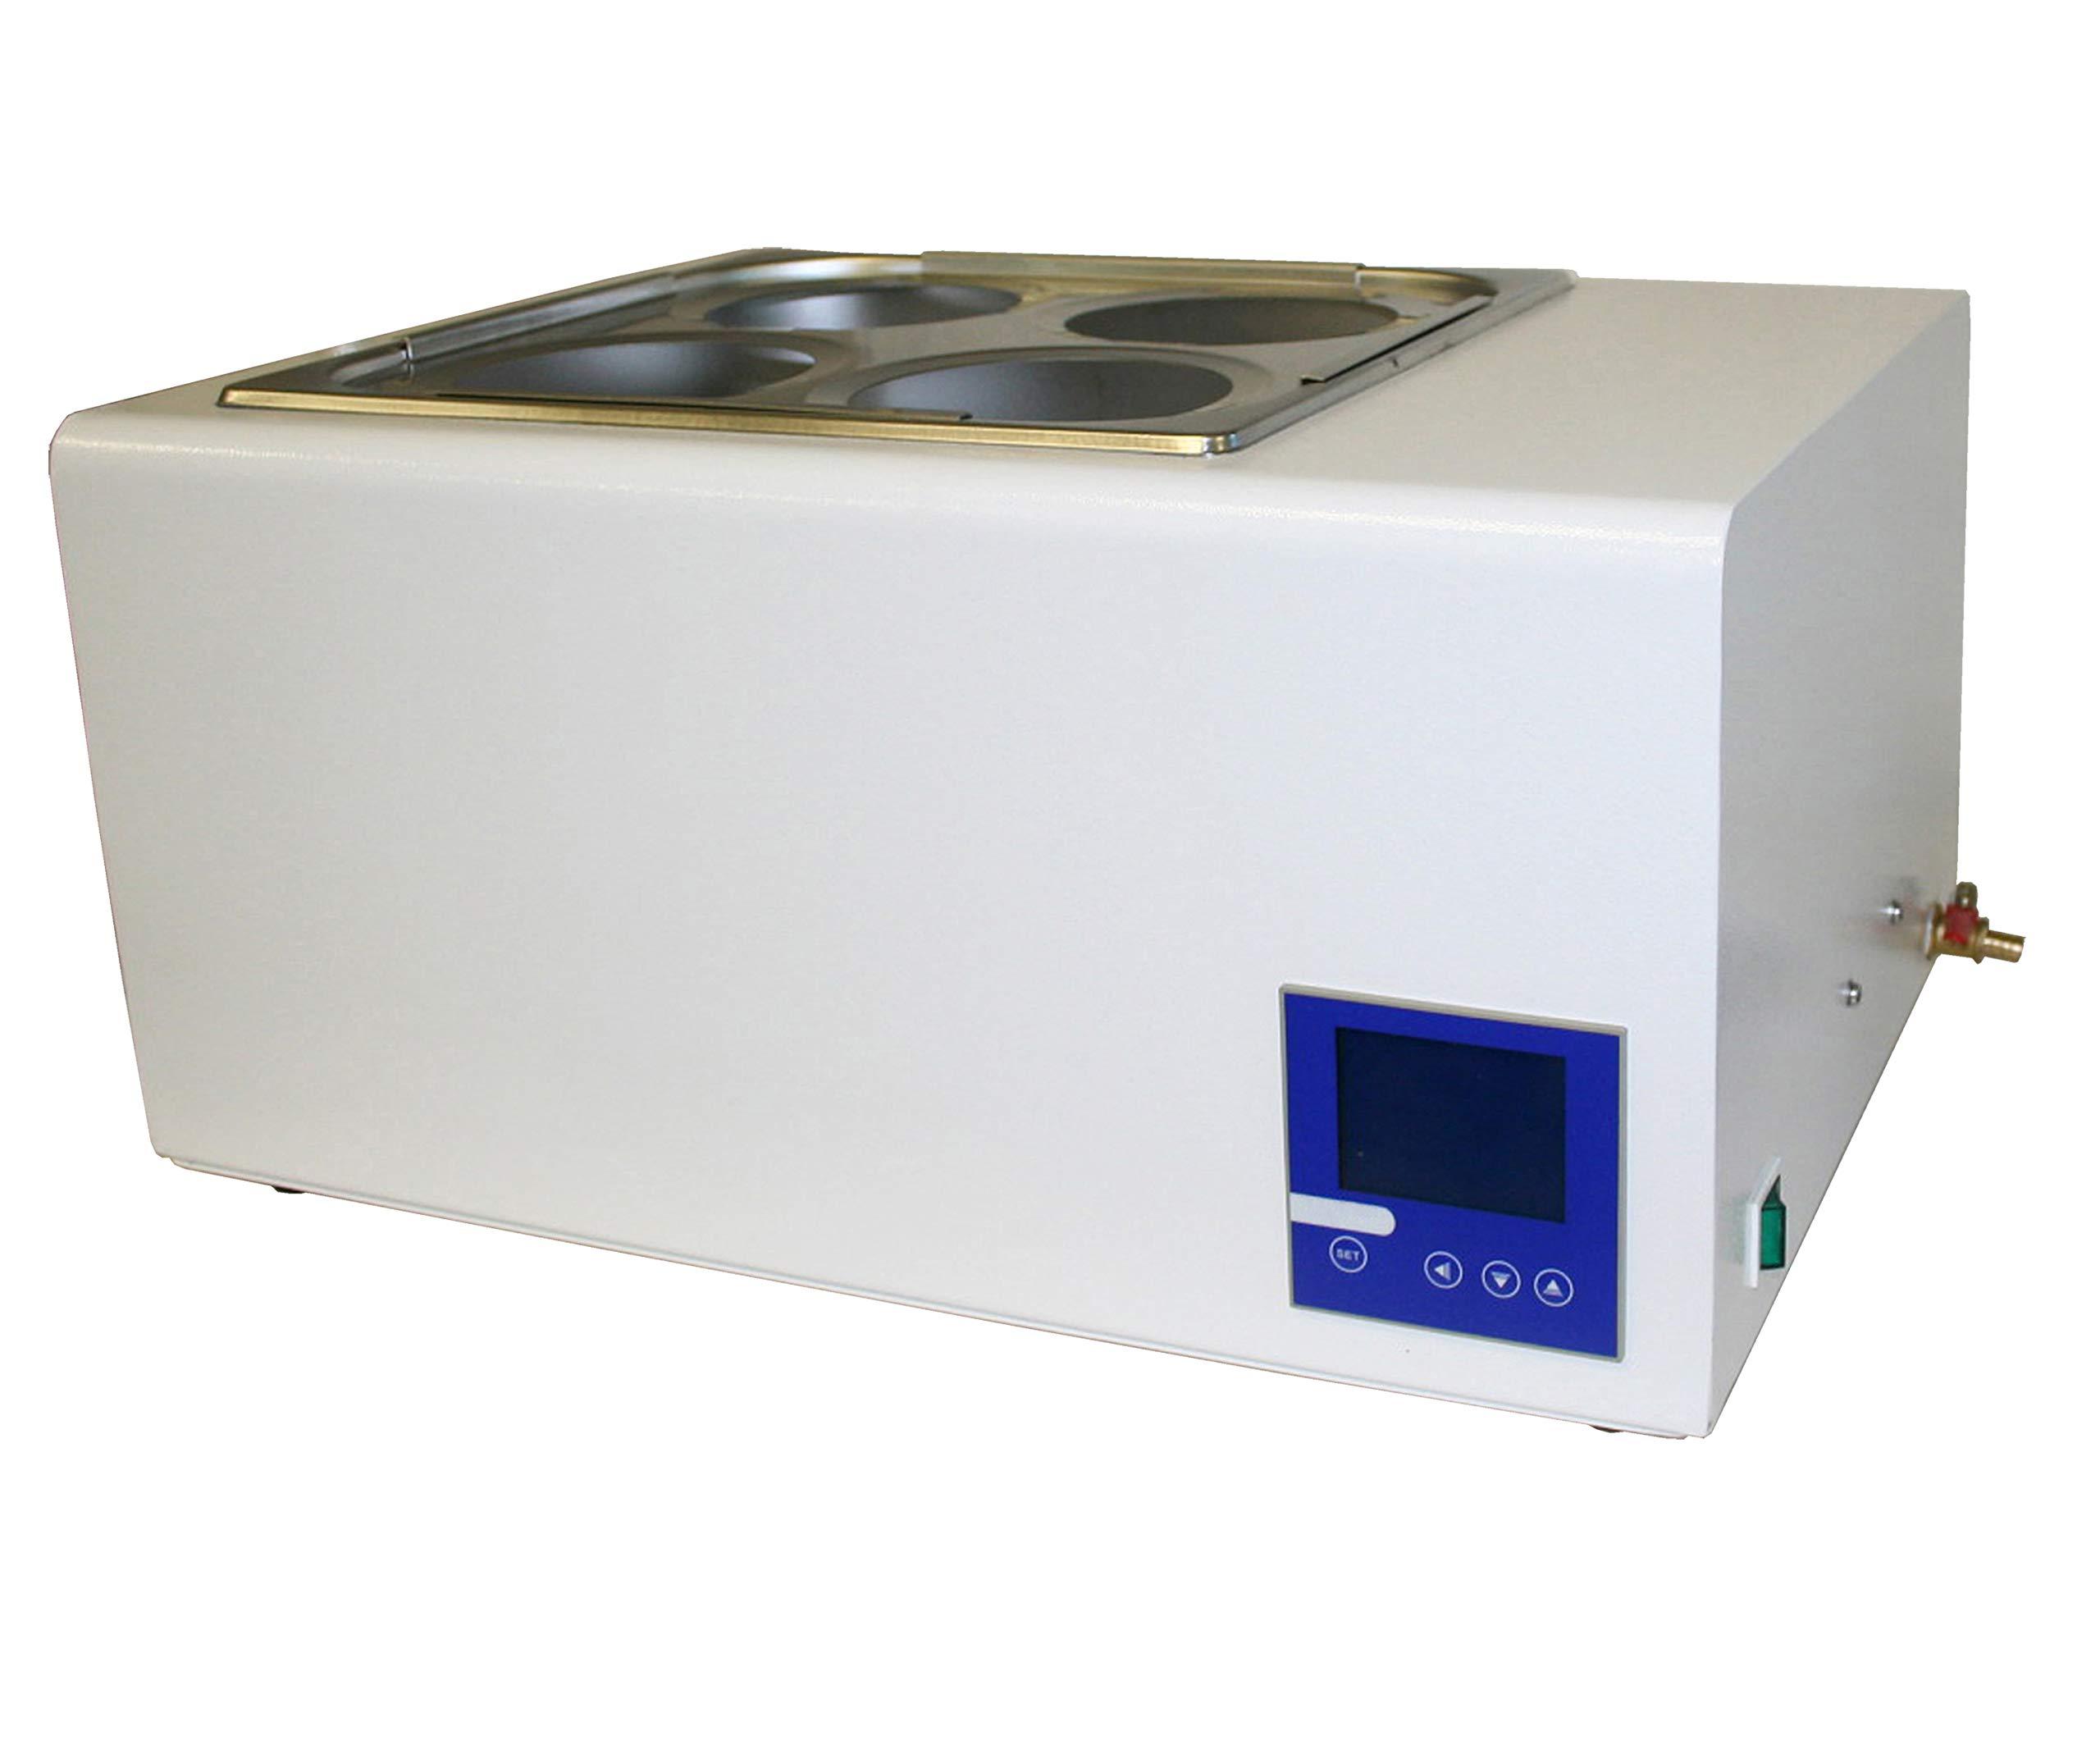 Jackson Global JS-HW-8L Digital Water Bath   Capacity:8 Liter   Temperature Range: 5-99 ºC   Voltage: 110V / 50-60Hz   Temperature Fluctuation: ±0.2 ºC